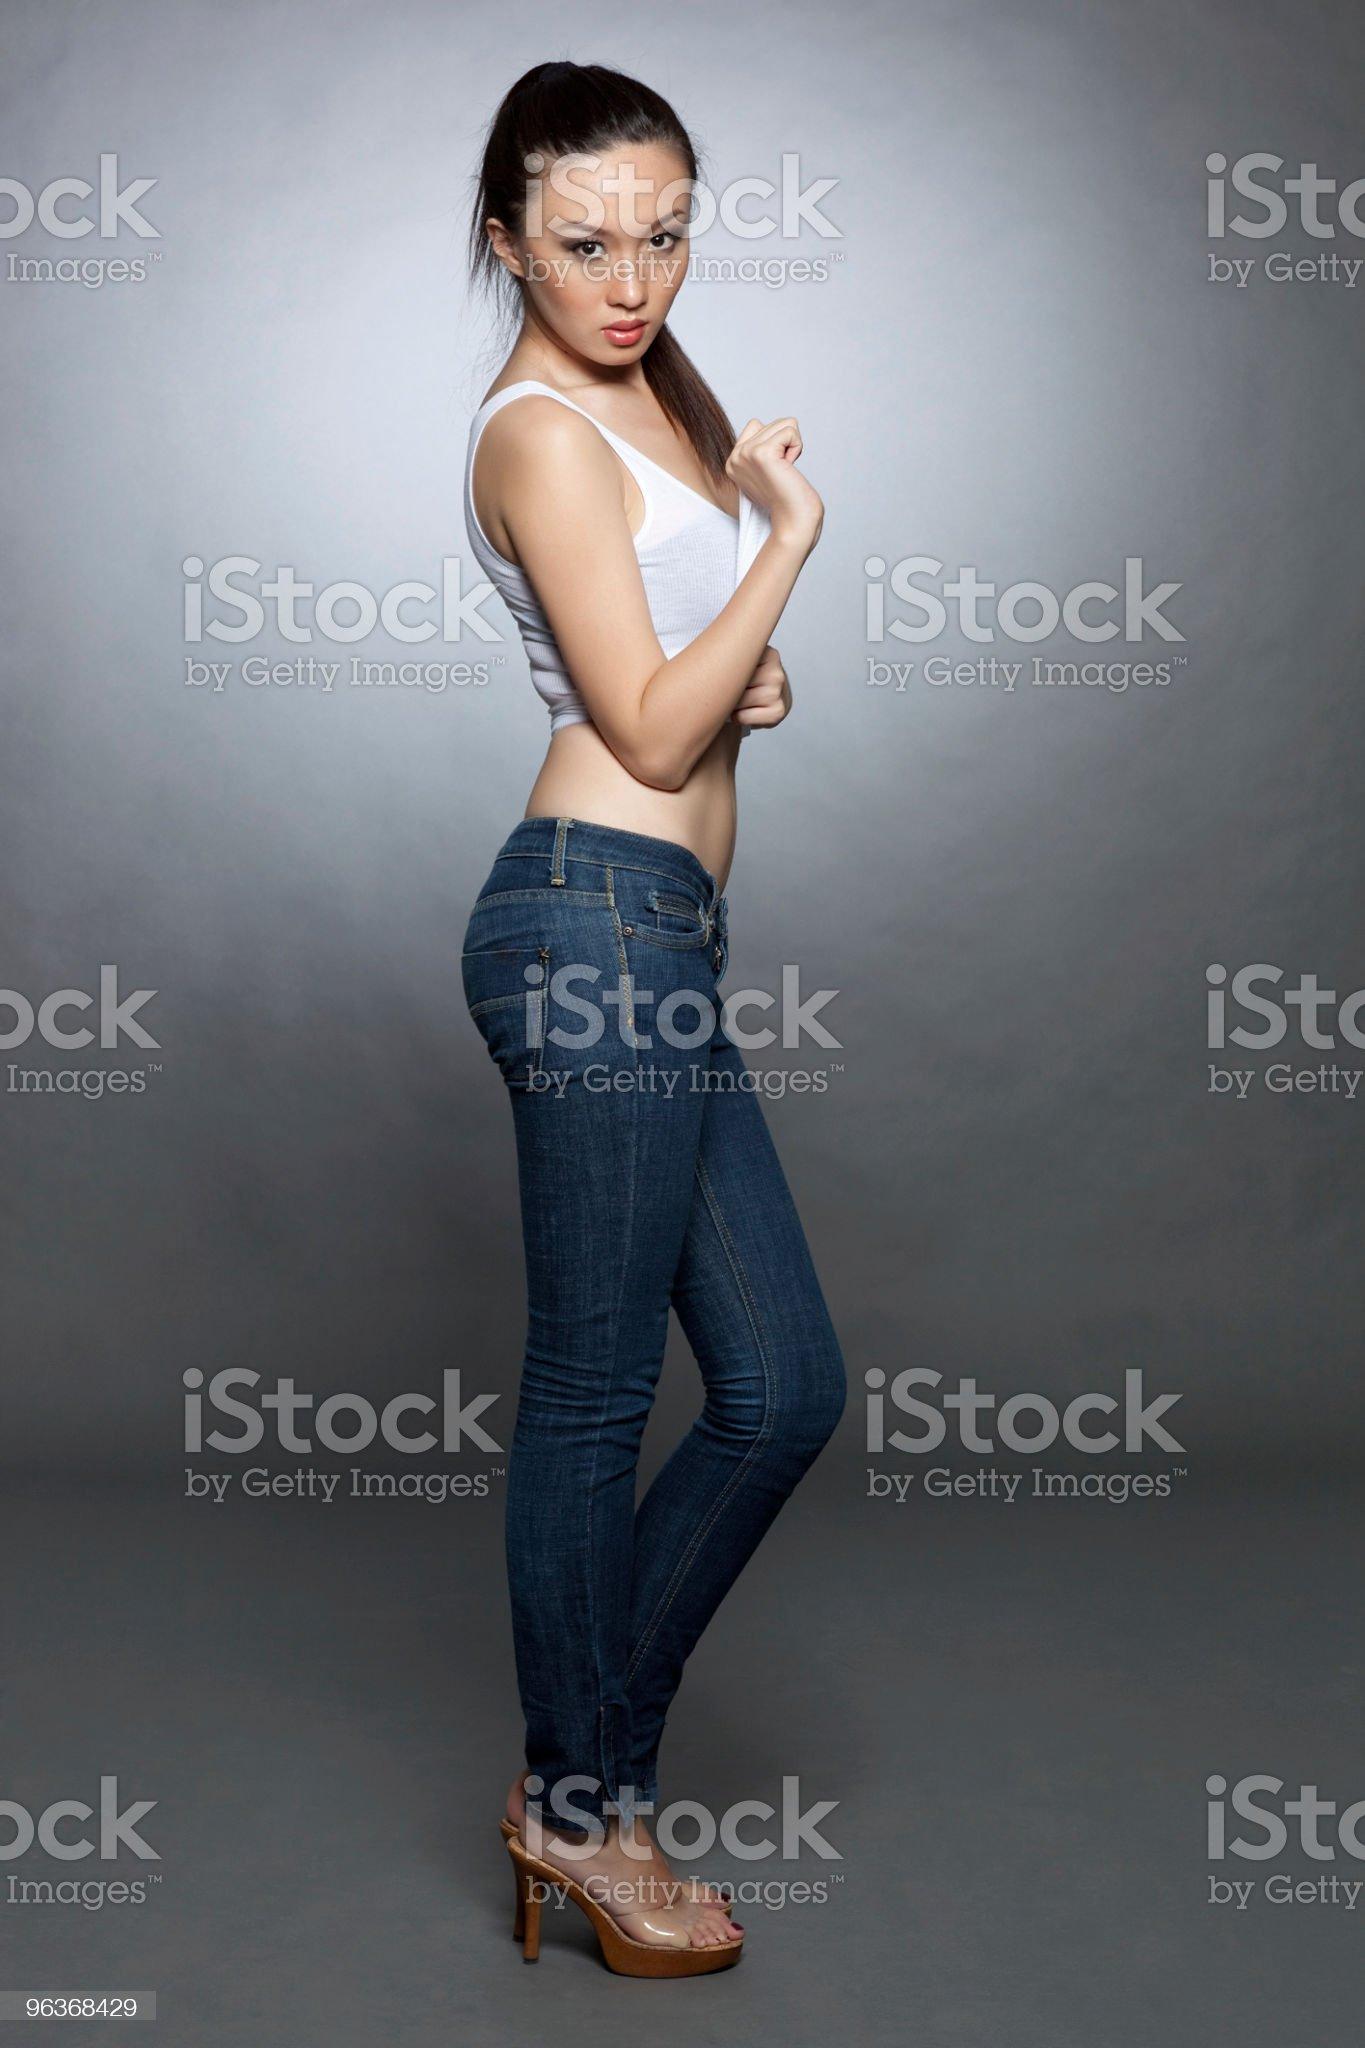 Sexy denim royalty-free stock photo